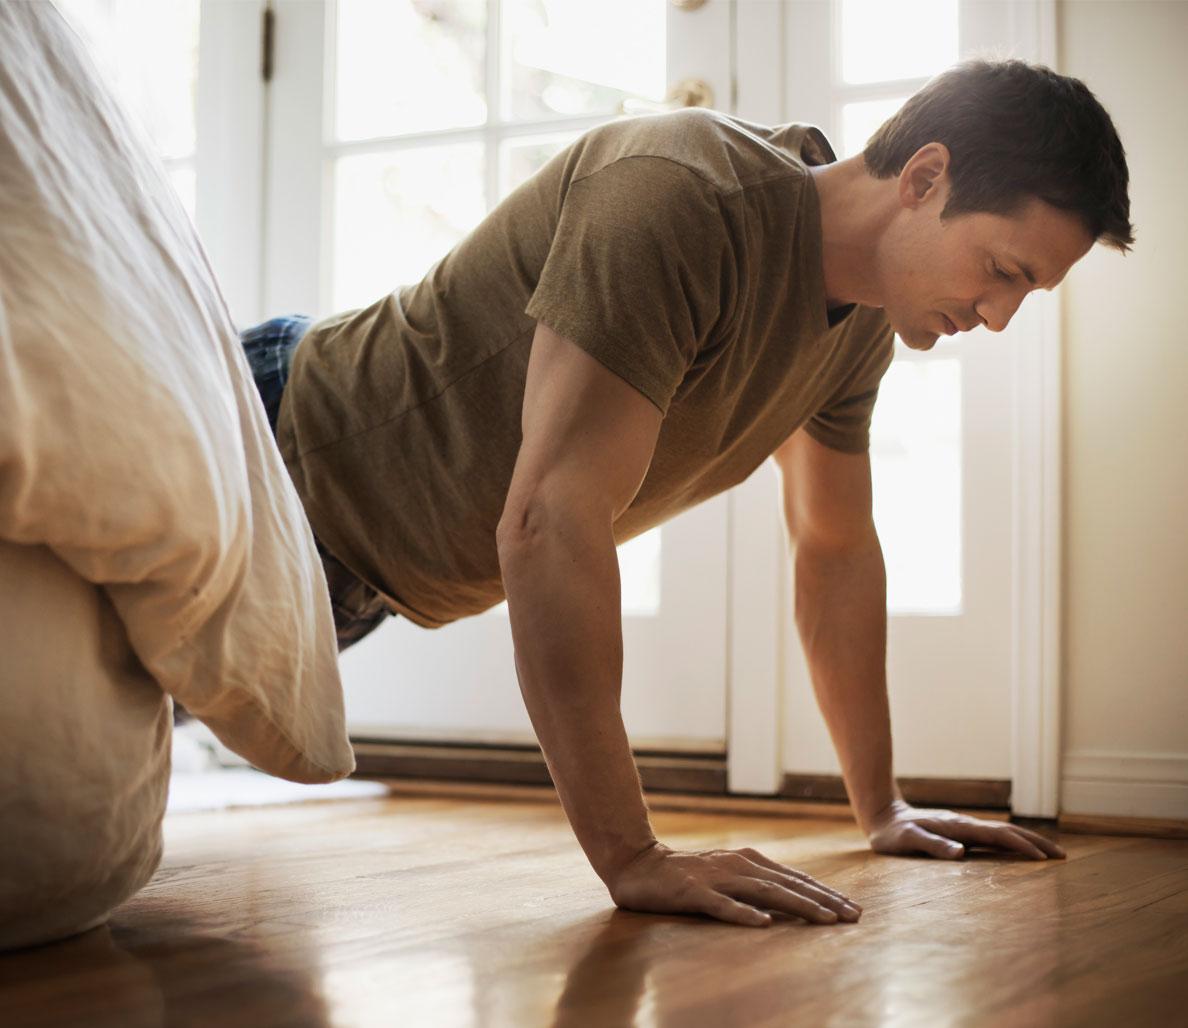 at-home-workouts-main